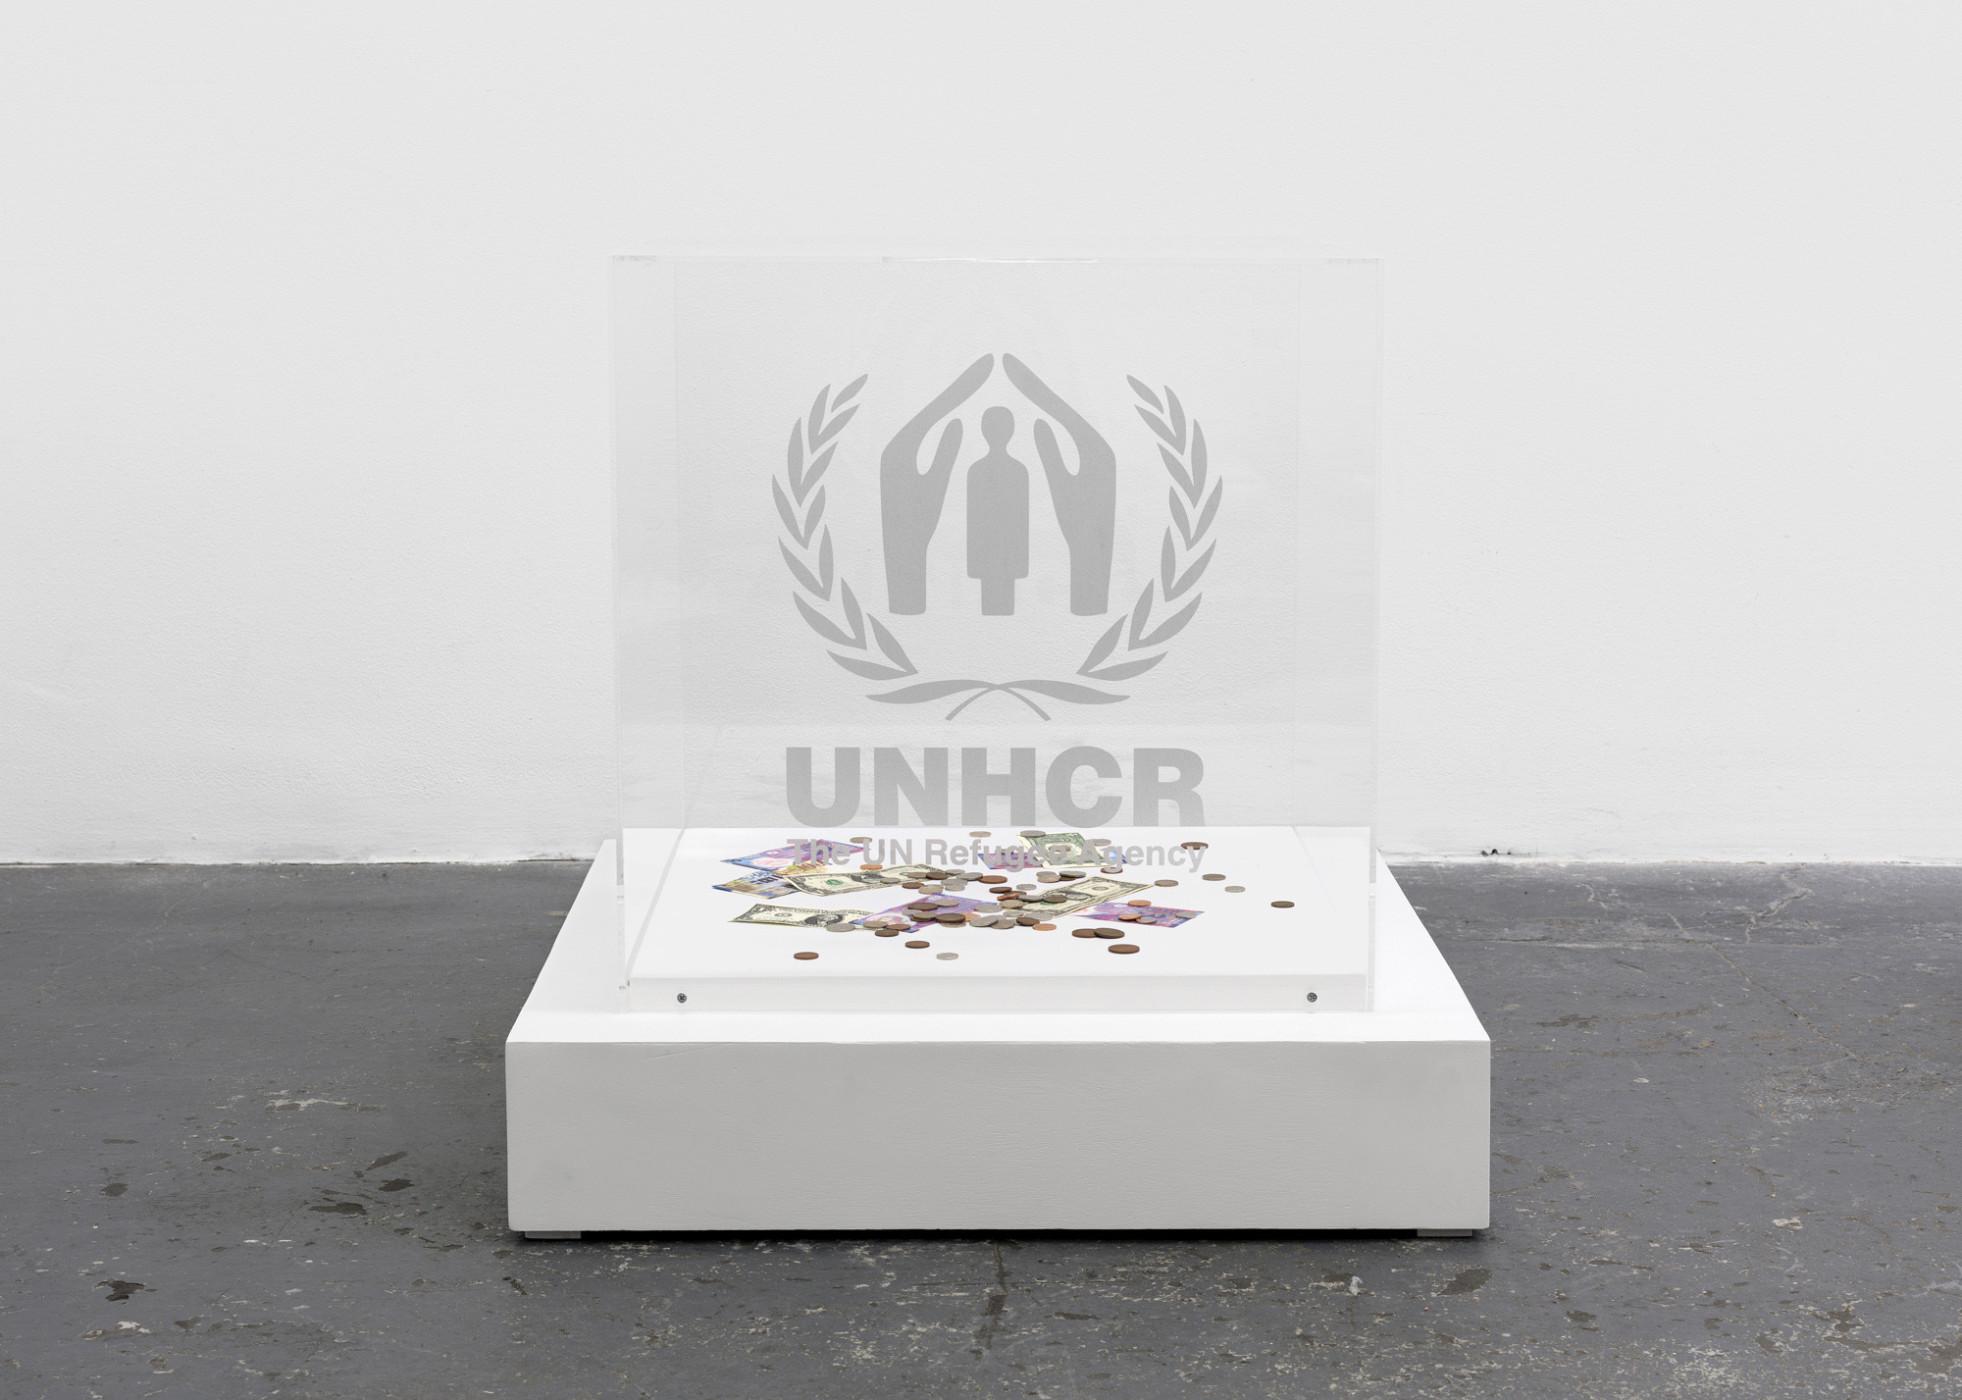 "<div class=""title""><em>Contribution Cube (UNHCR)</em>, 2004/2016</div><div class=""medium"">plexiglass vitrine, vinyl sticker, wood base</div><div class=""dimensions"">79.0 x 76.0 x 76.0 cm<br />31 1/16 x 29 7/8 x 29 7/8 in.</div>"